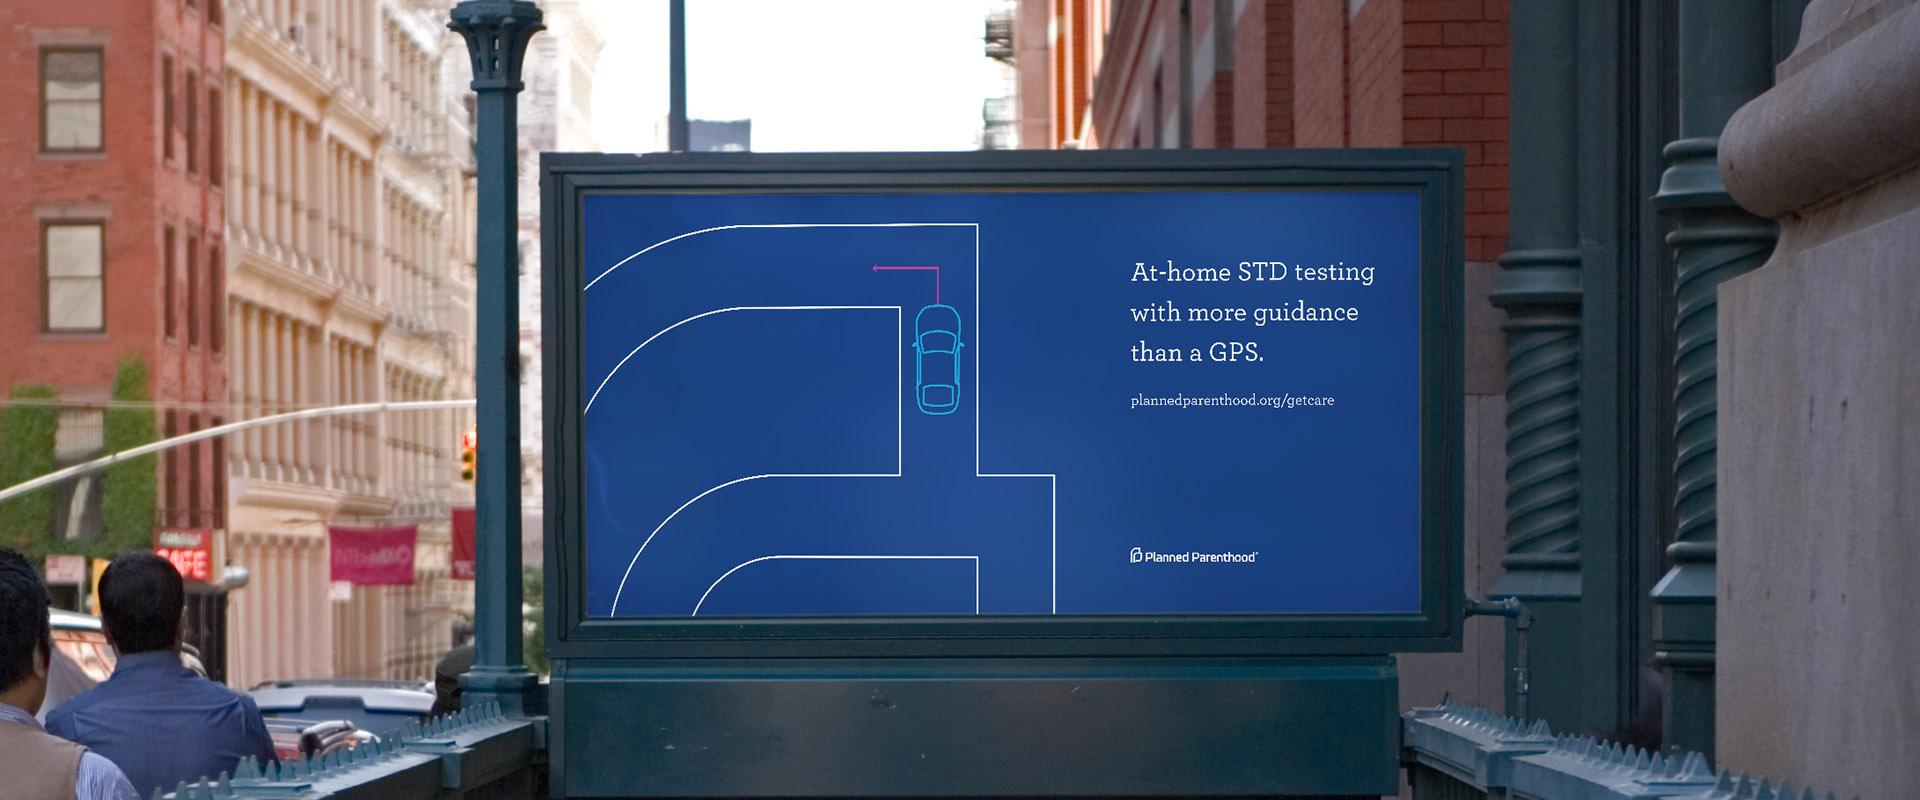 bluprint-case-studies-ppfa-ohs-ad-gps-subway.jpg